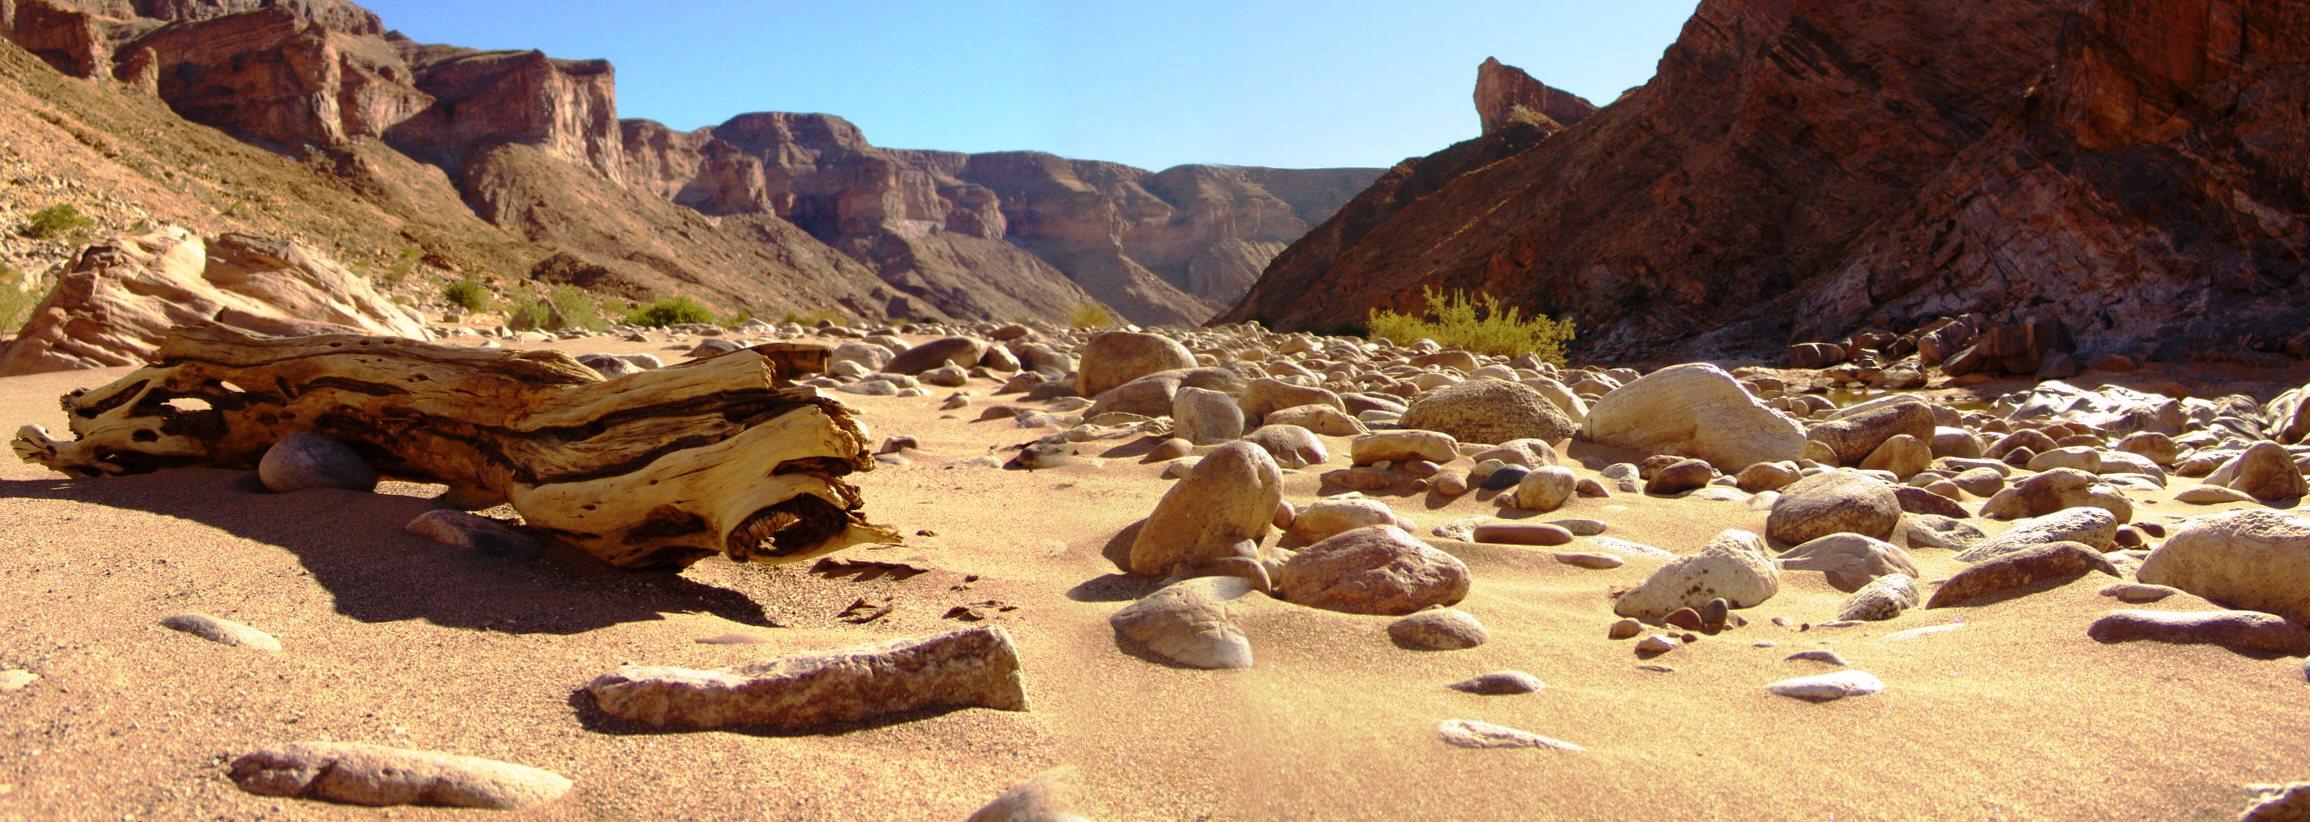 2008 - Sun-bleached log, Fish River Canyon, Namibia